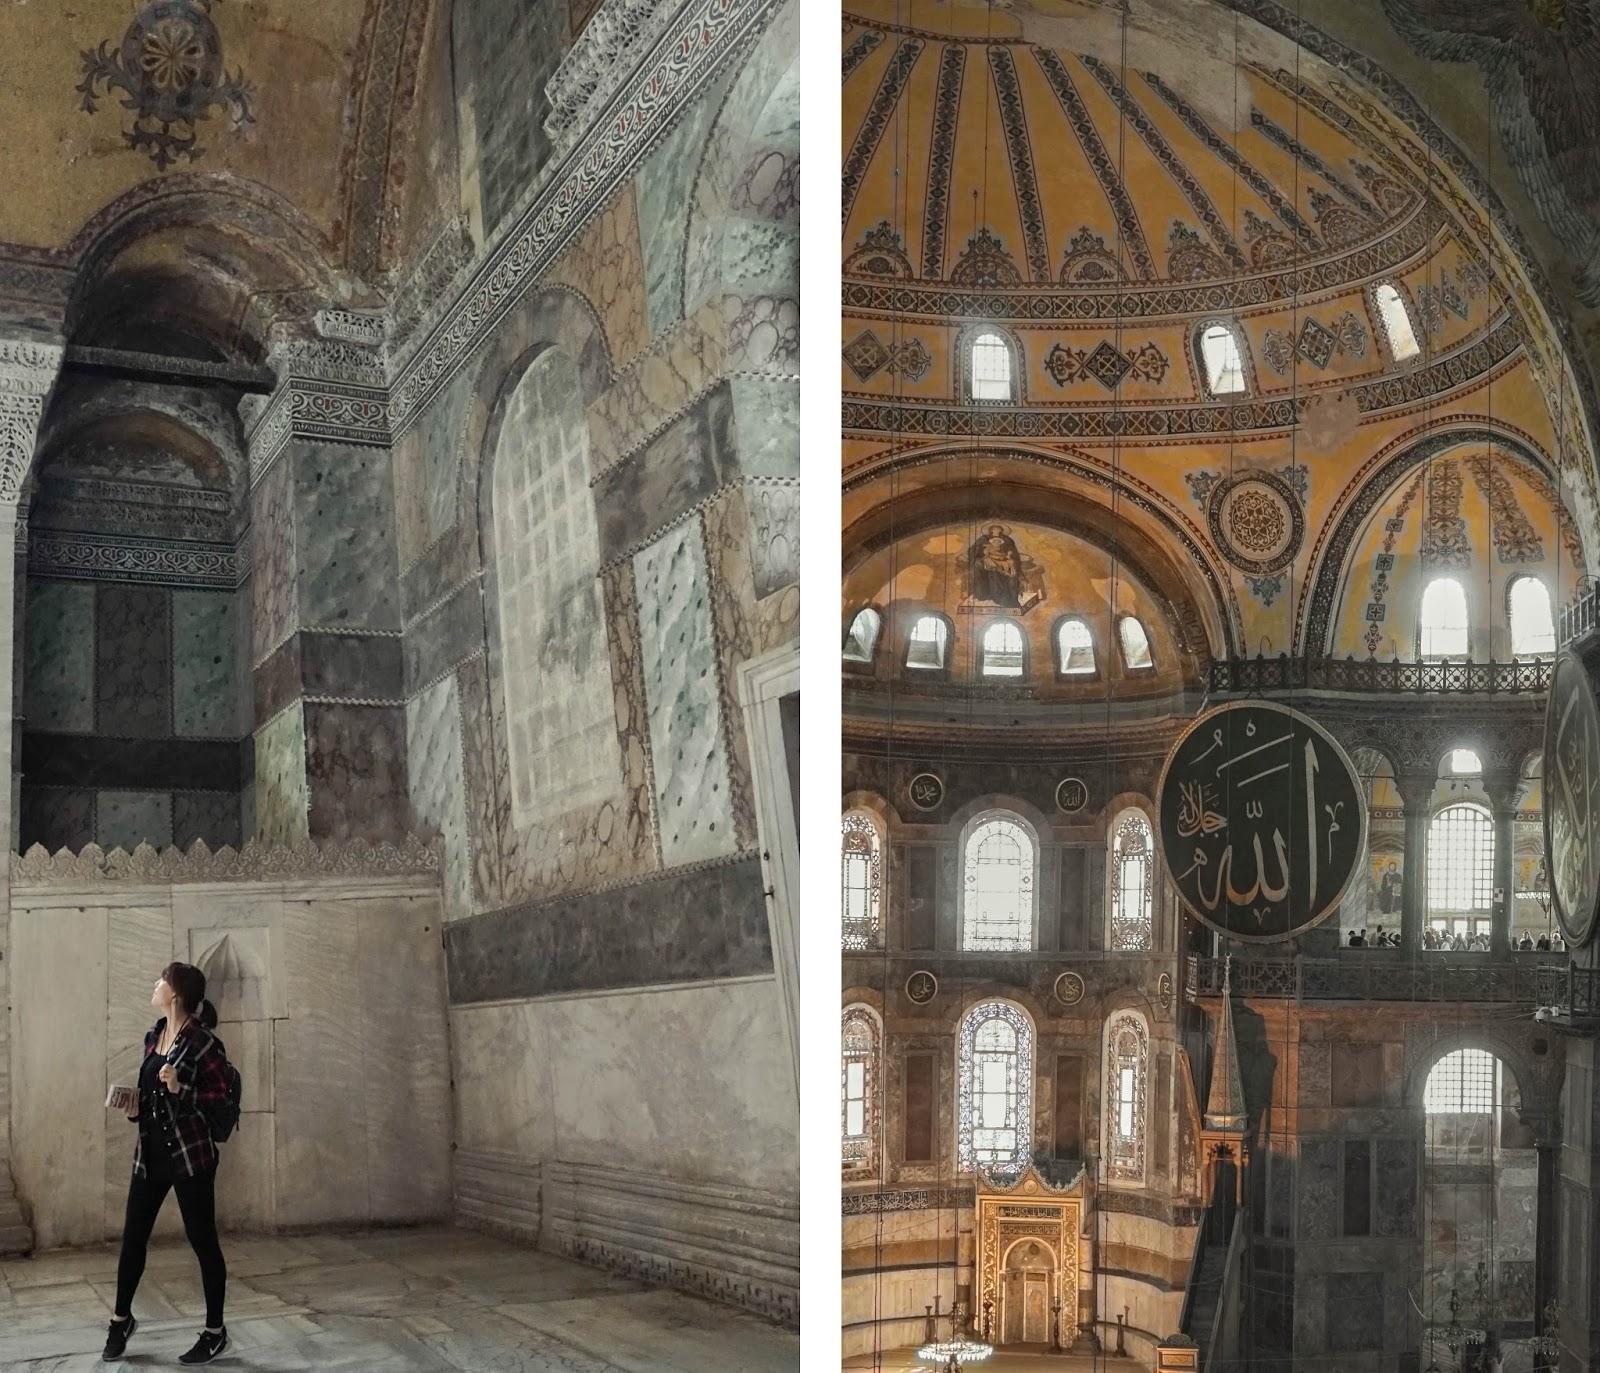 Istanbul Photo Diary - April 2016 | hnc journal